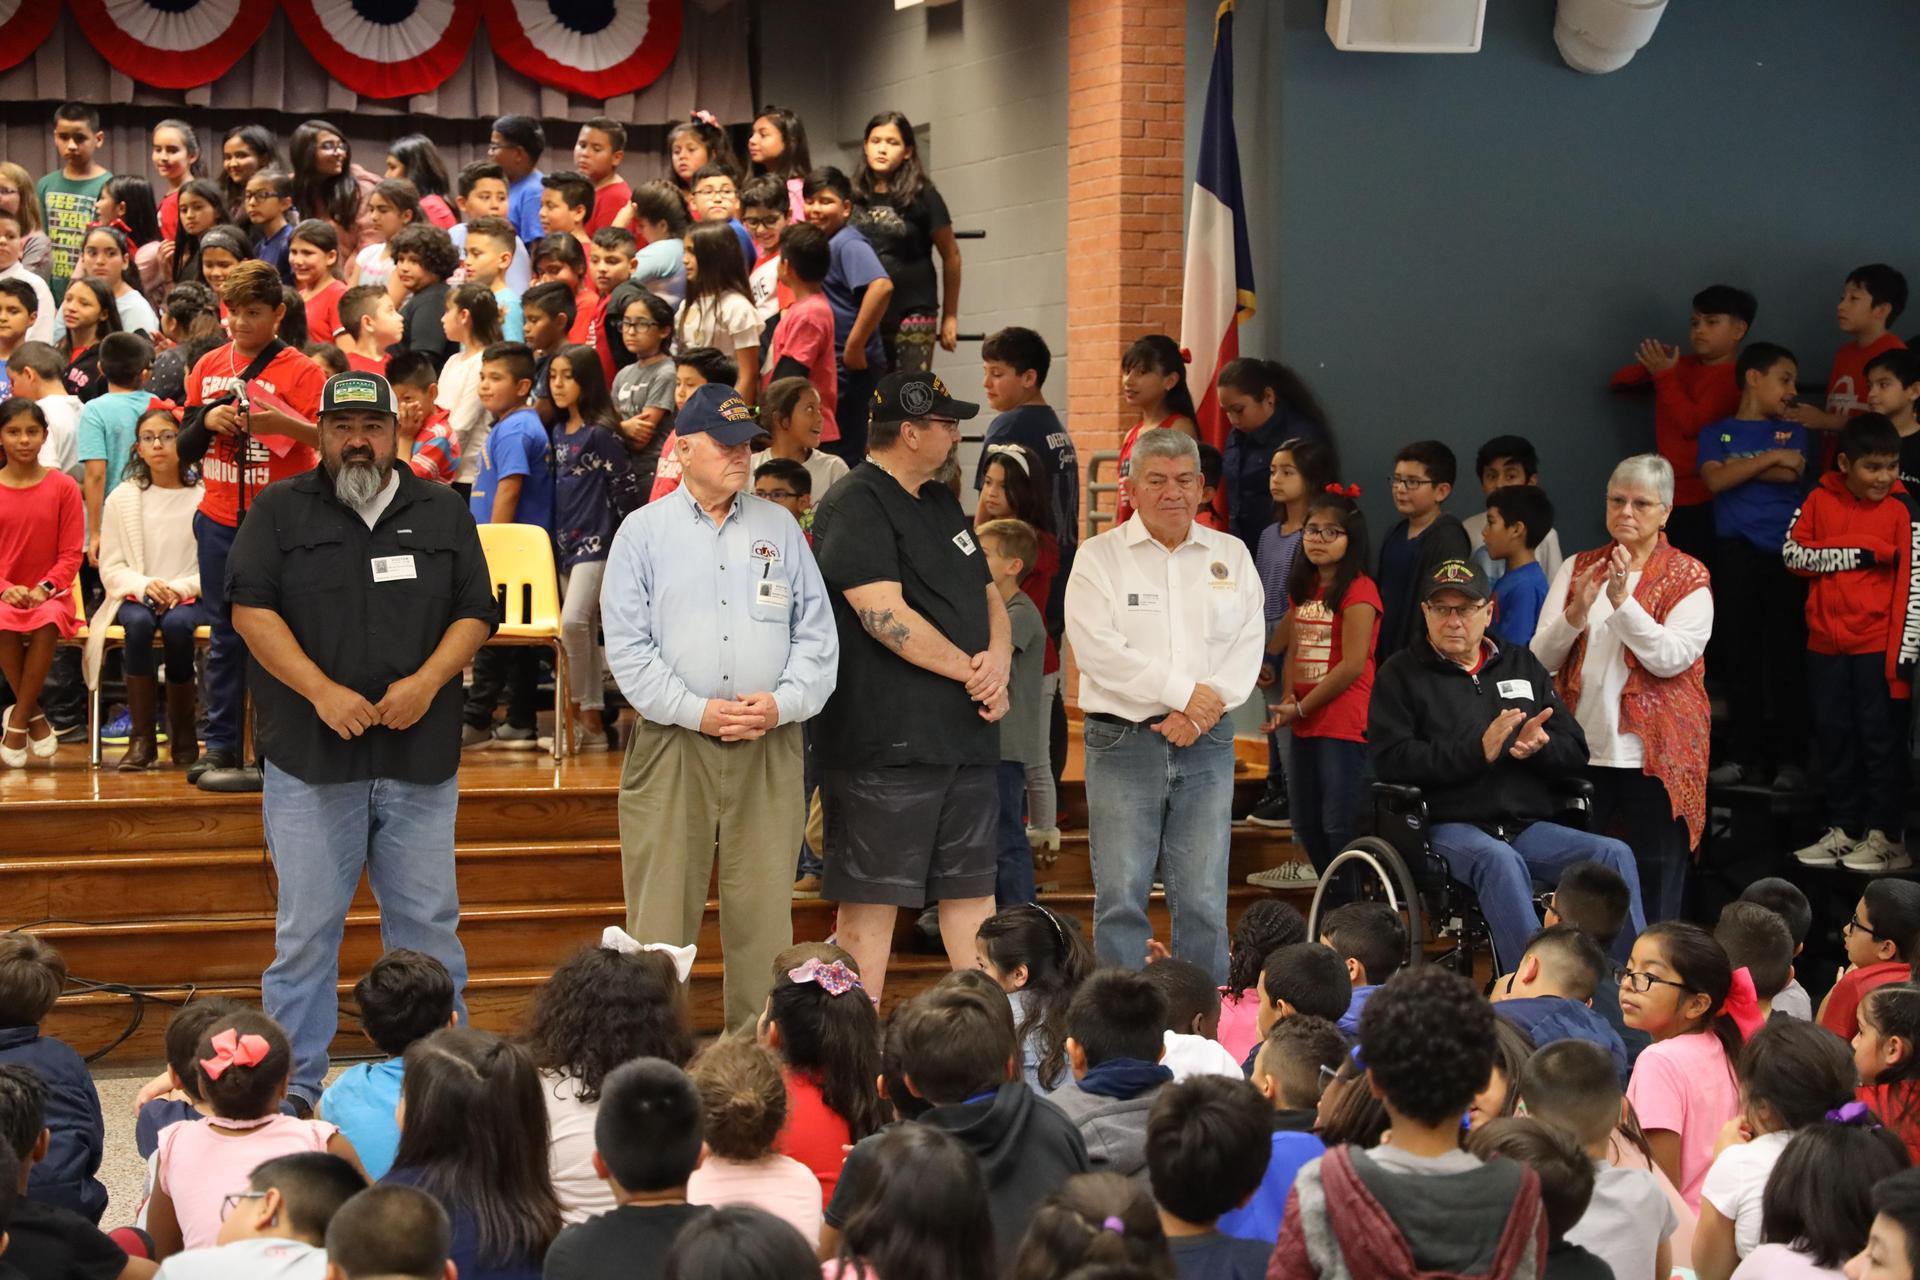 Deepwater Elementary students celebrate Veterans Day